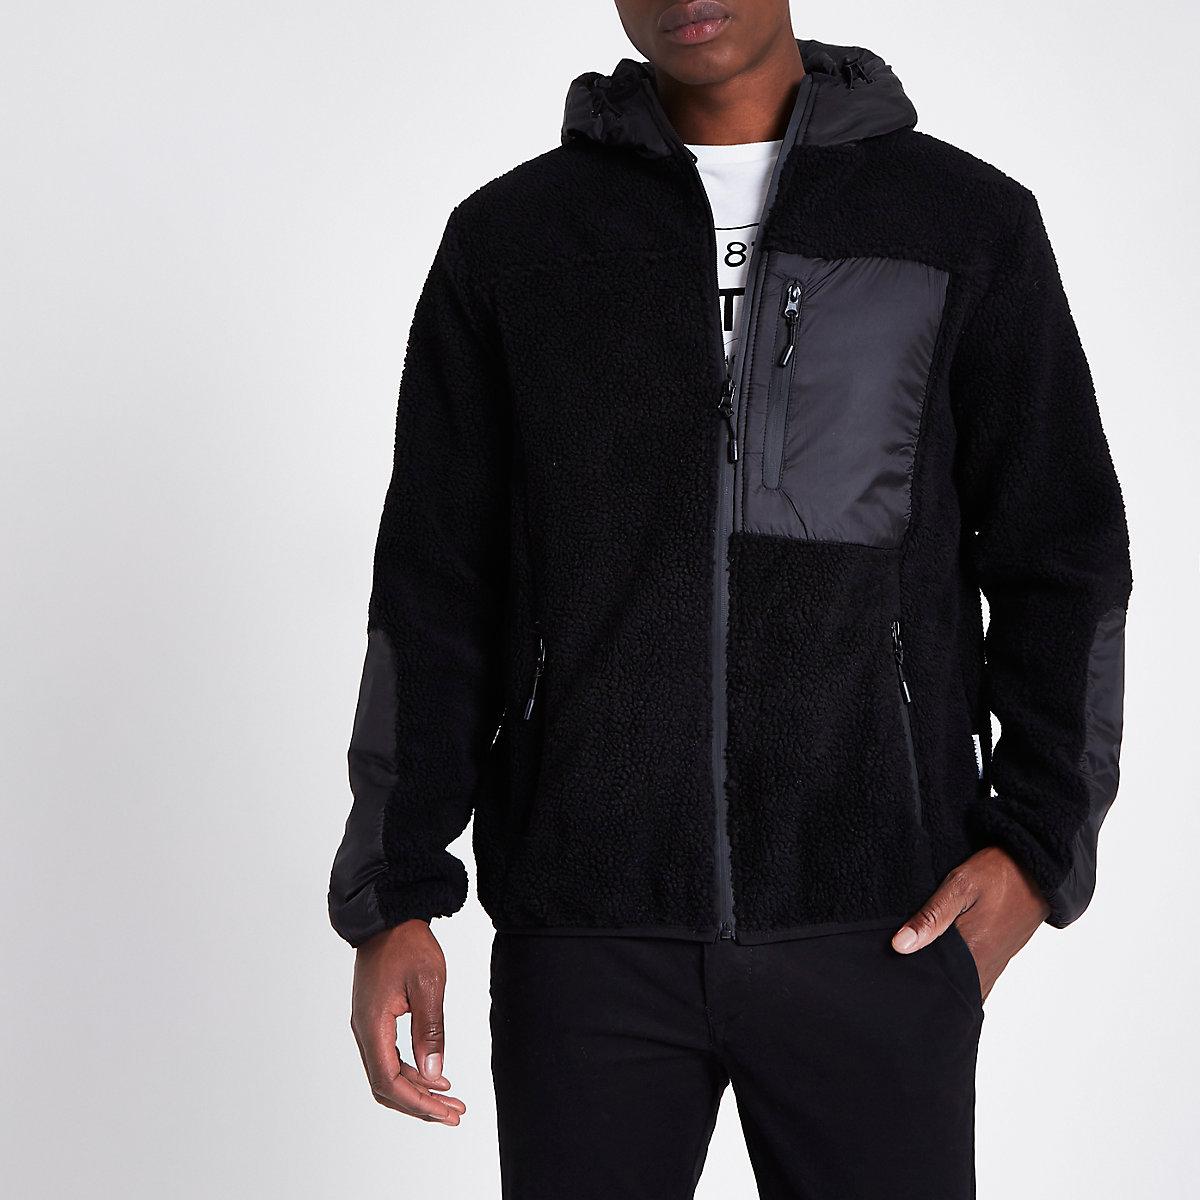 Bellfield – Schwarze Kapuzenjacke aus Fleece mit Reißverschluss